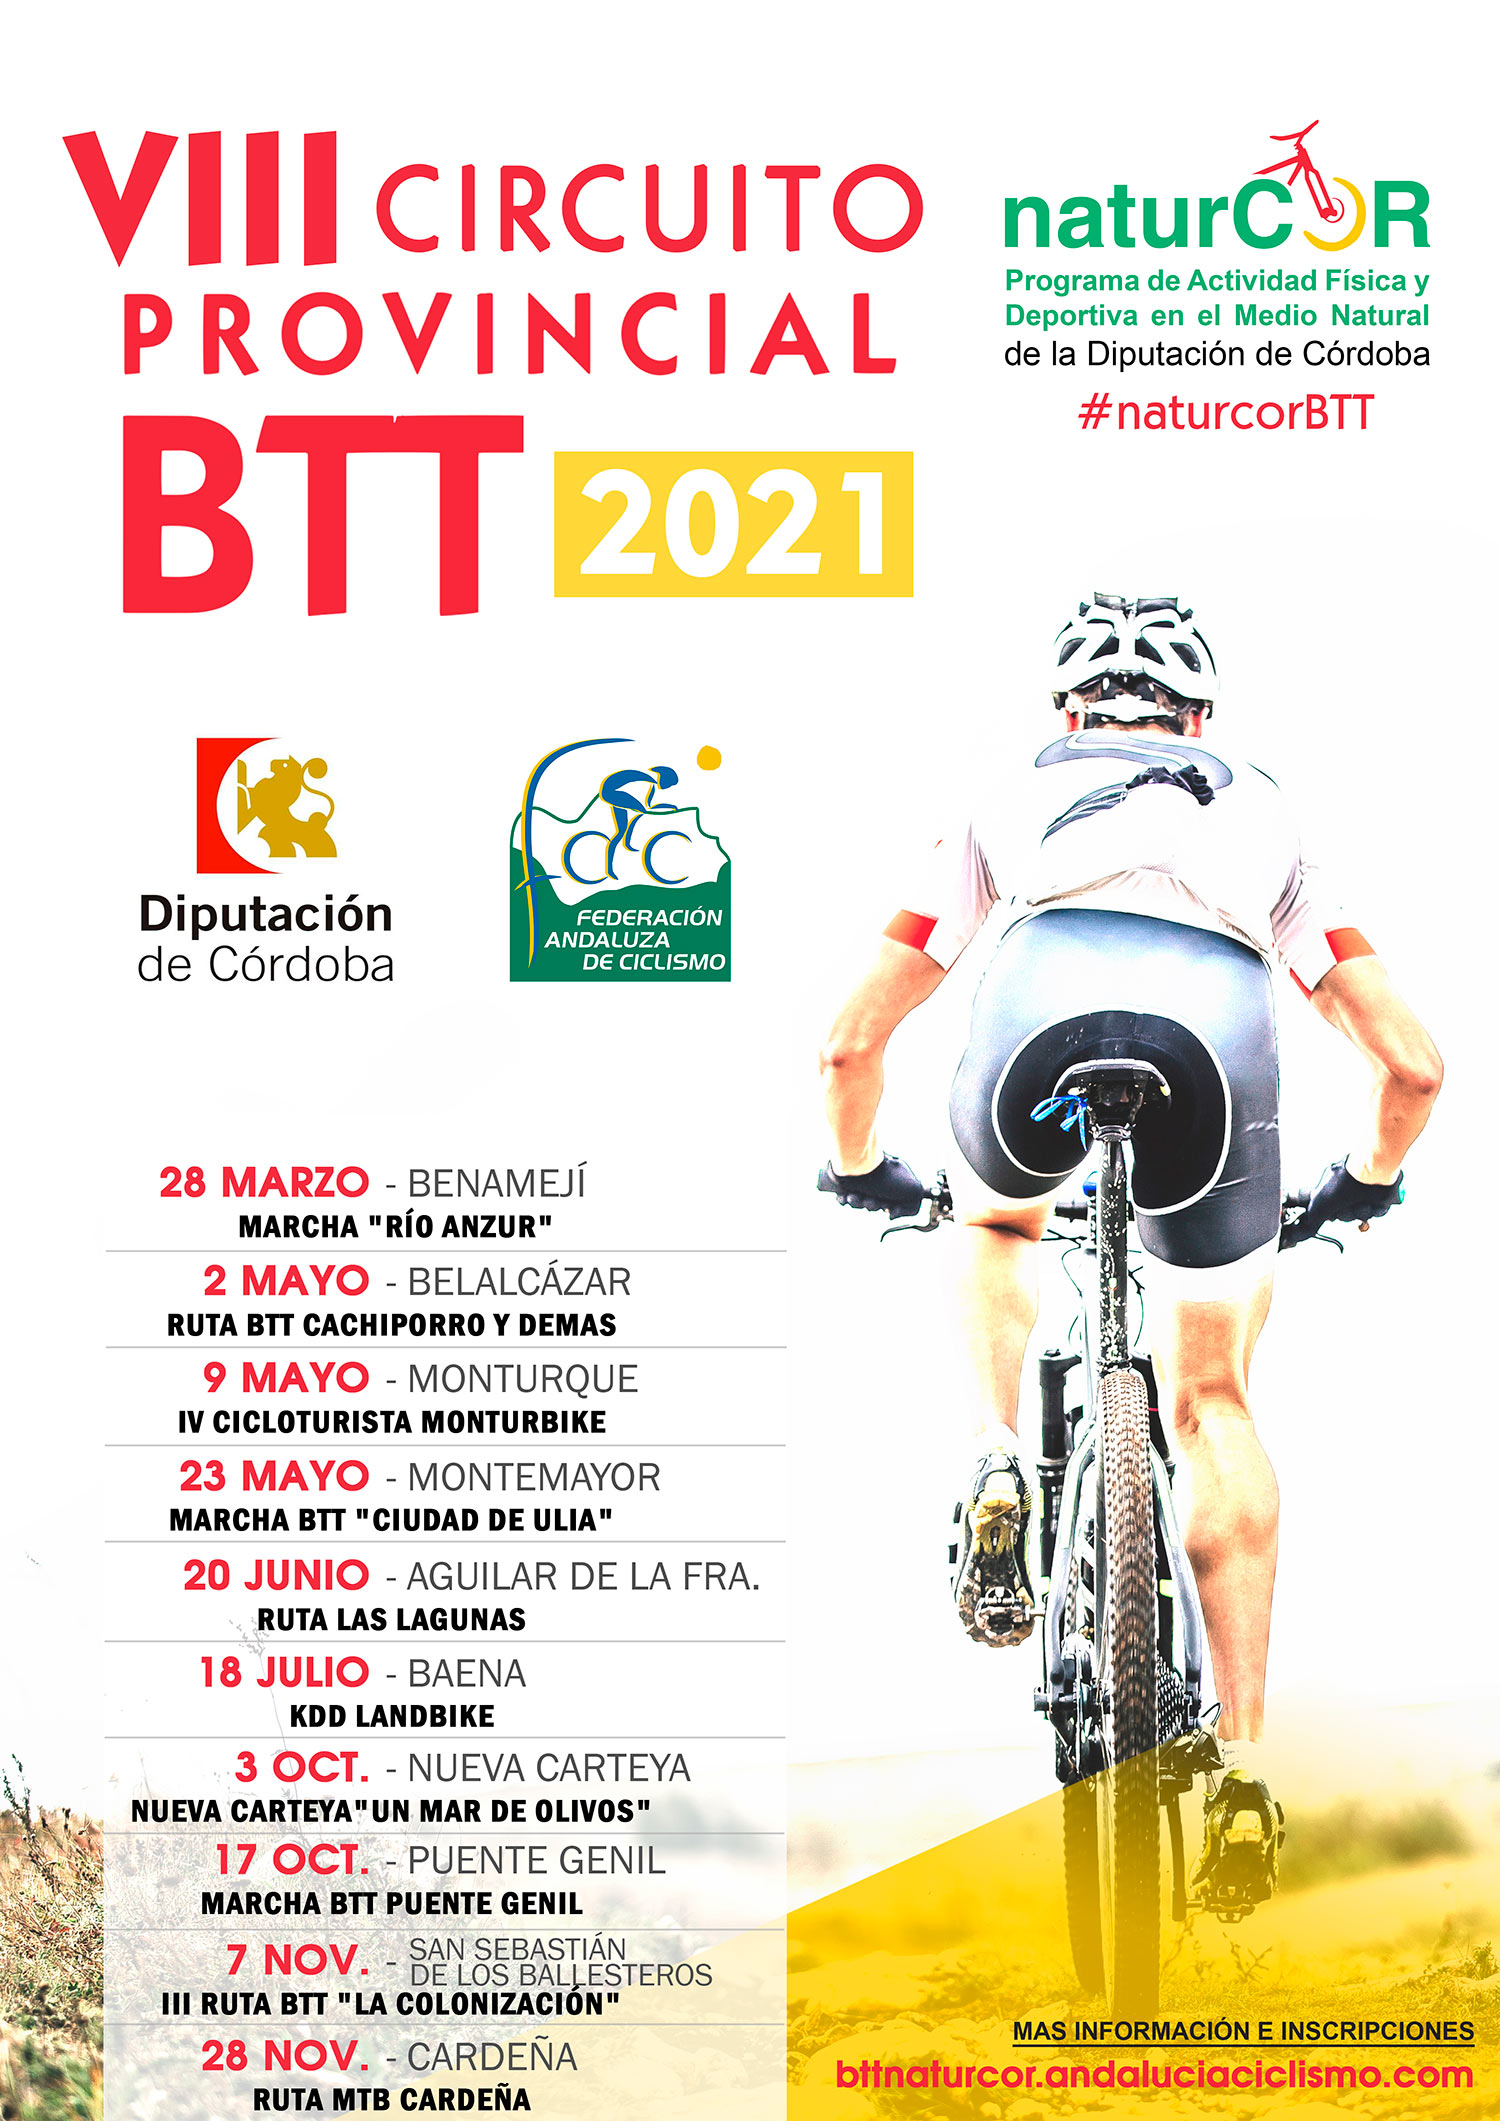 El VIII Circuito Provincial de BTT NaturCor regresará en Belalcázar